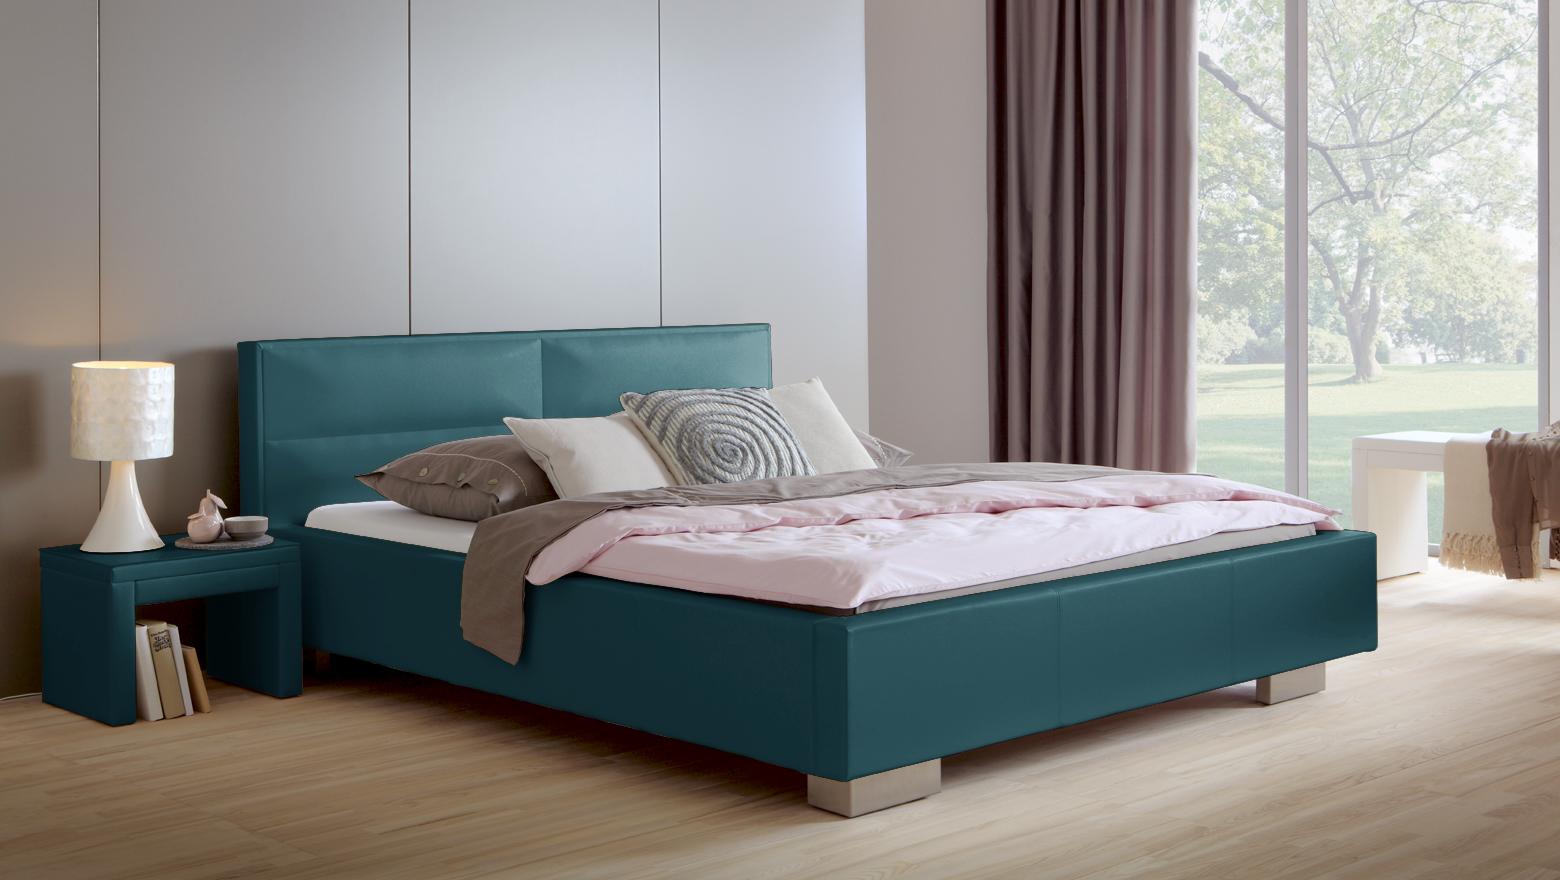 polsterbett shade lederbett mit beigem kunstleder bezug. Black Bedroom Furniture Sets. Home Design Ideas